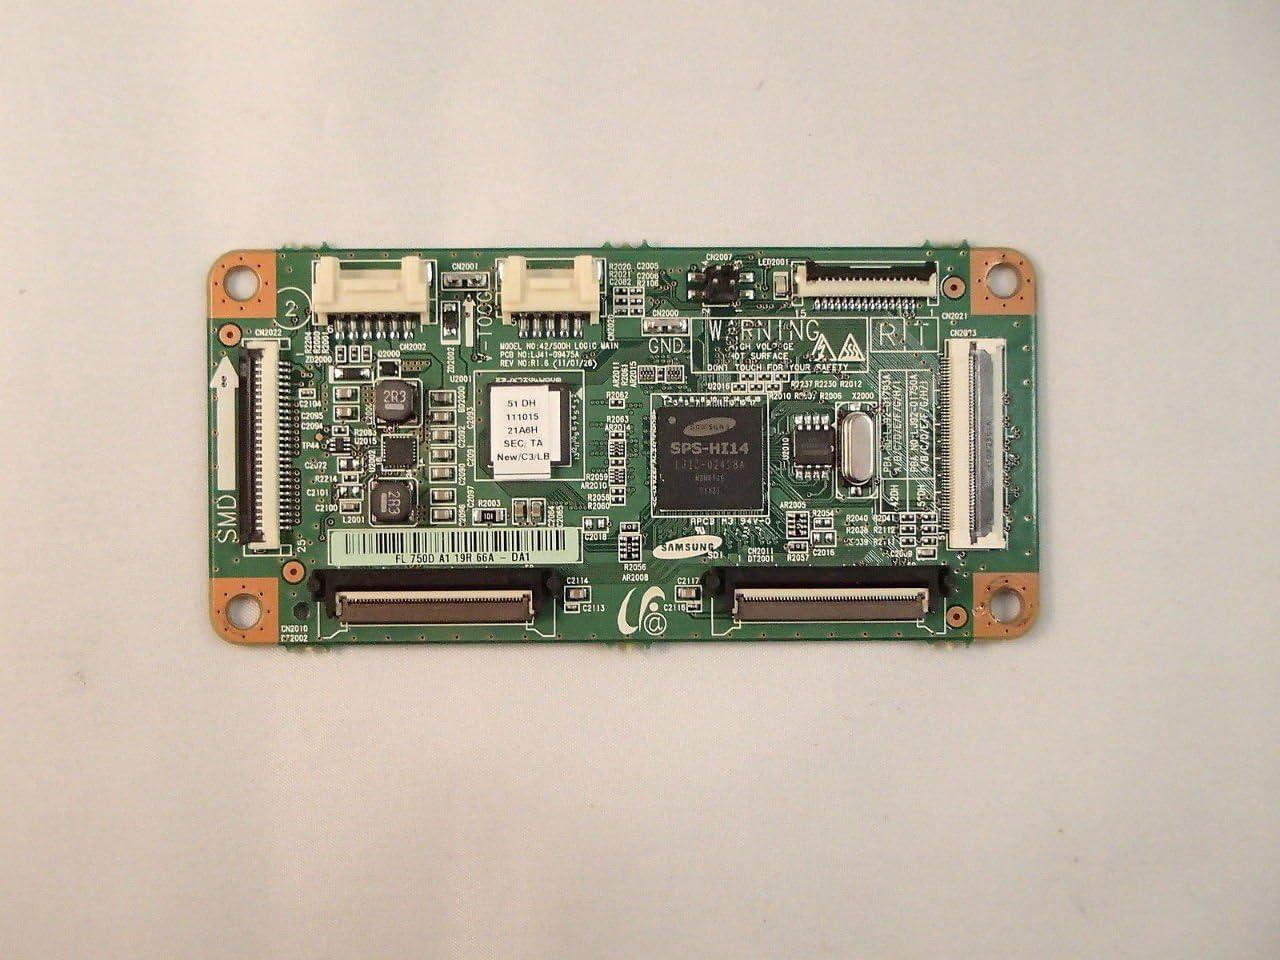 Samsung 51 PN51D430A LJ92-01750D T-Con LCD Logic Control Board Unit